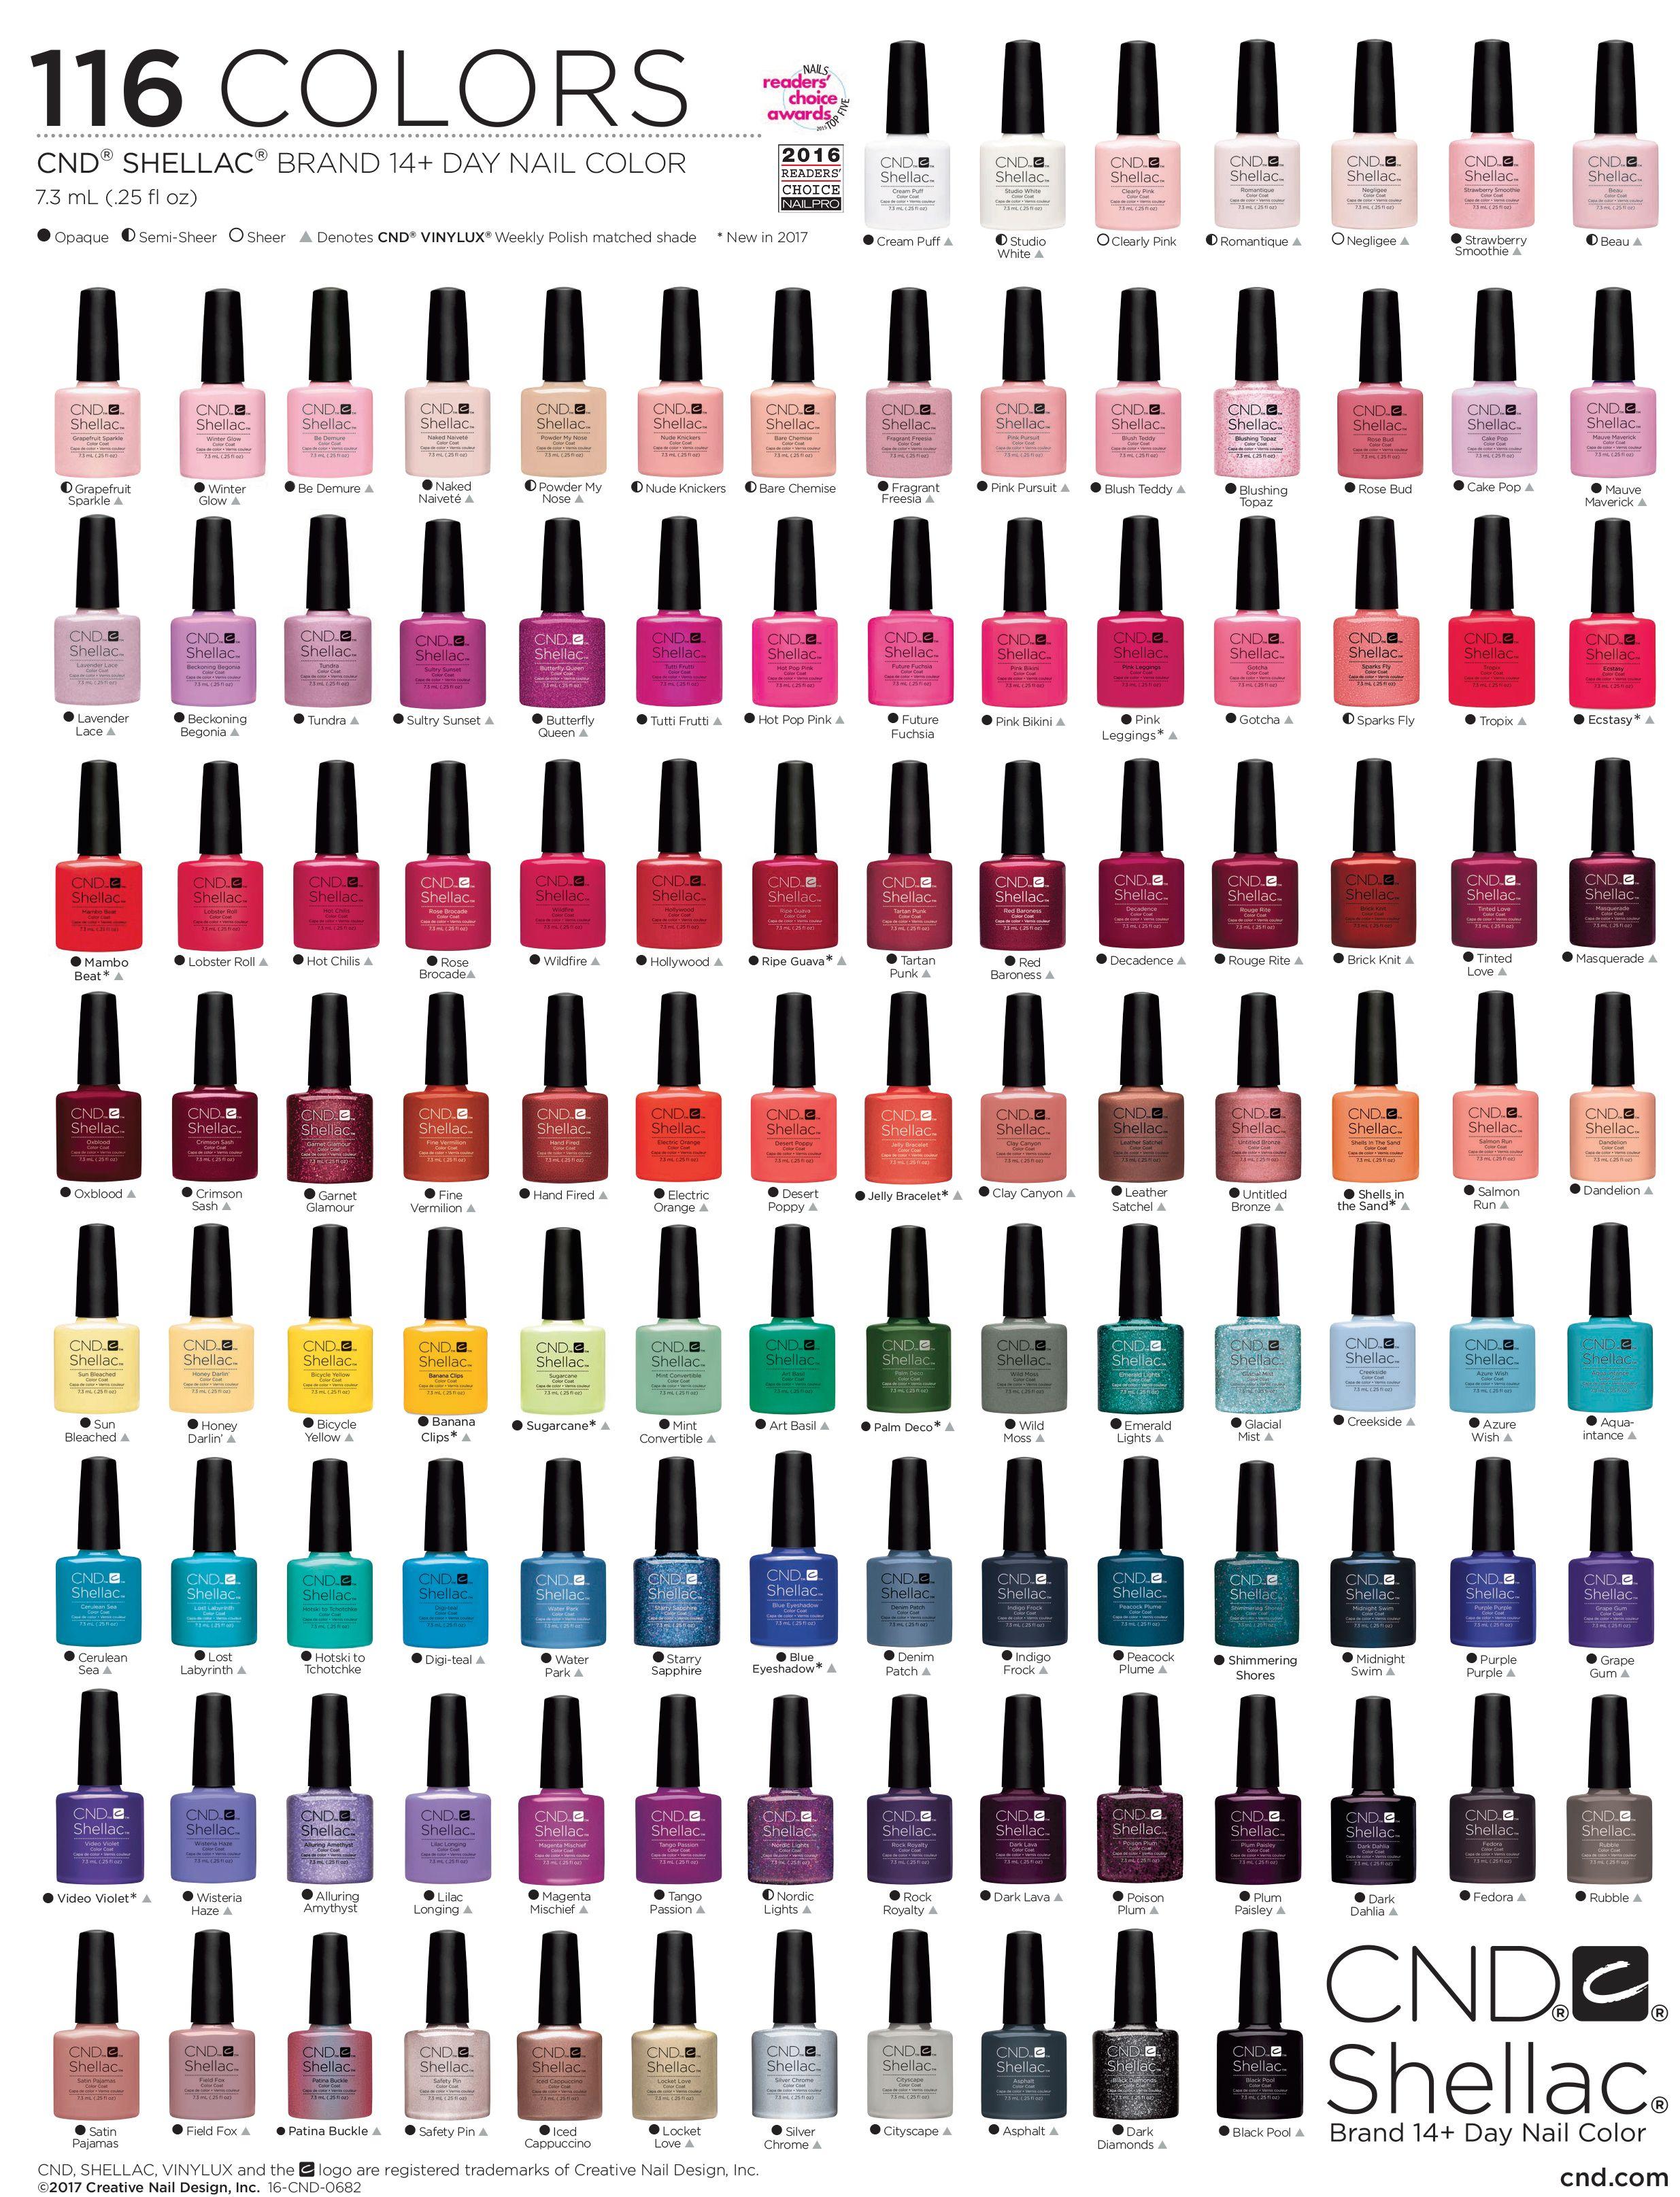 Cnd shellac nail polish chart beauty tips pinterest shellac